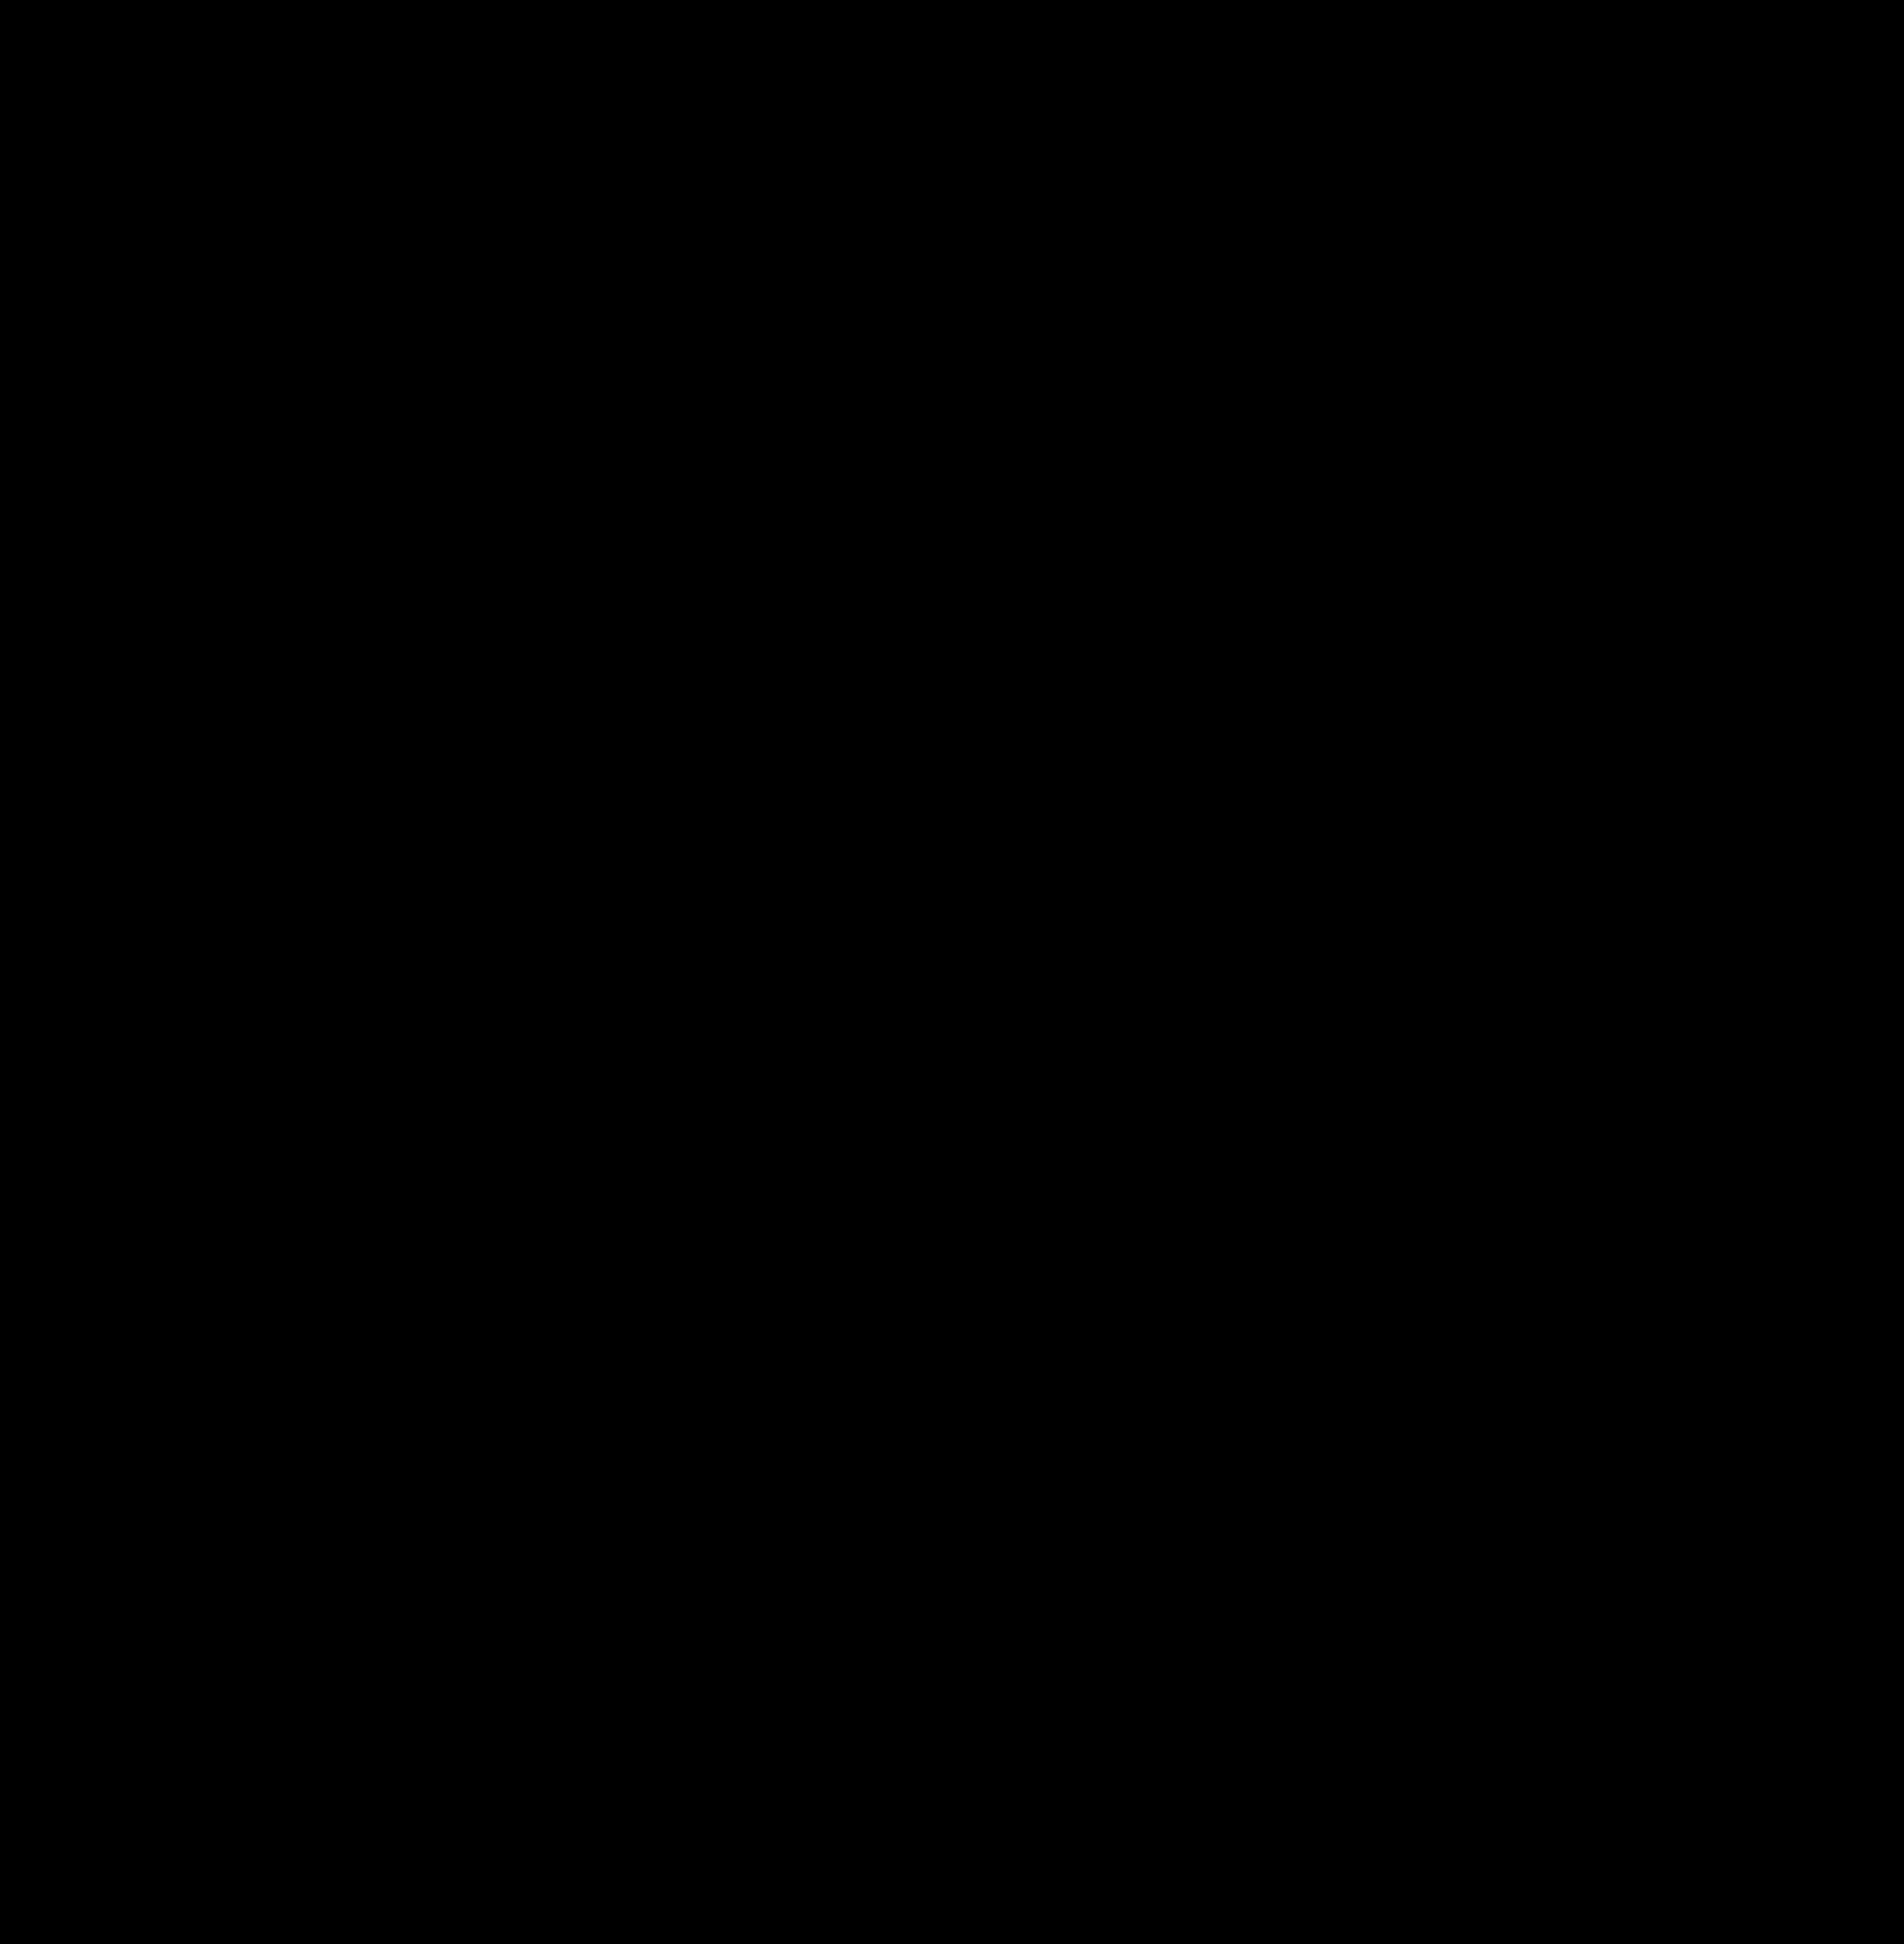 2063x2106 Clipart